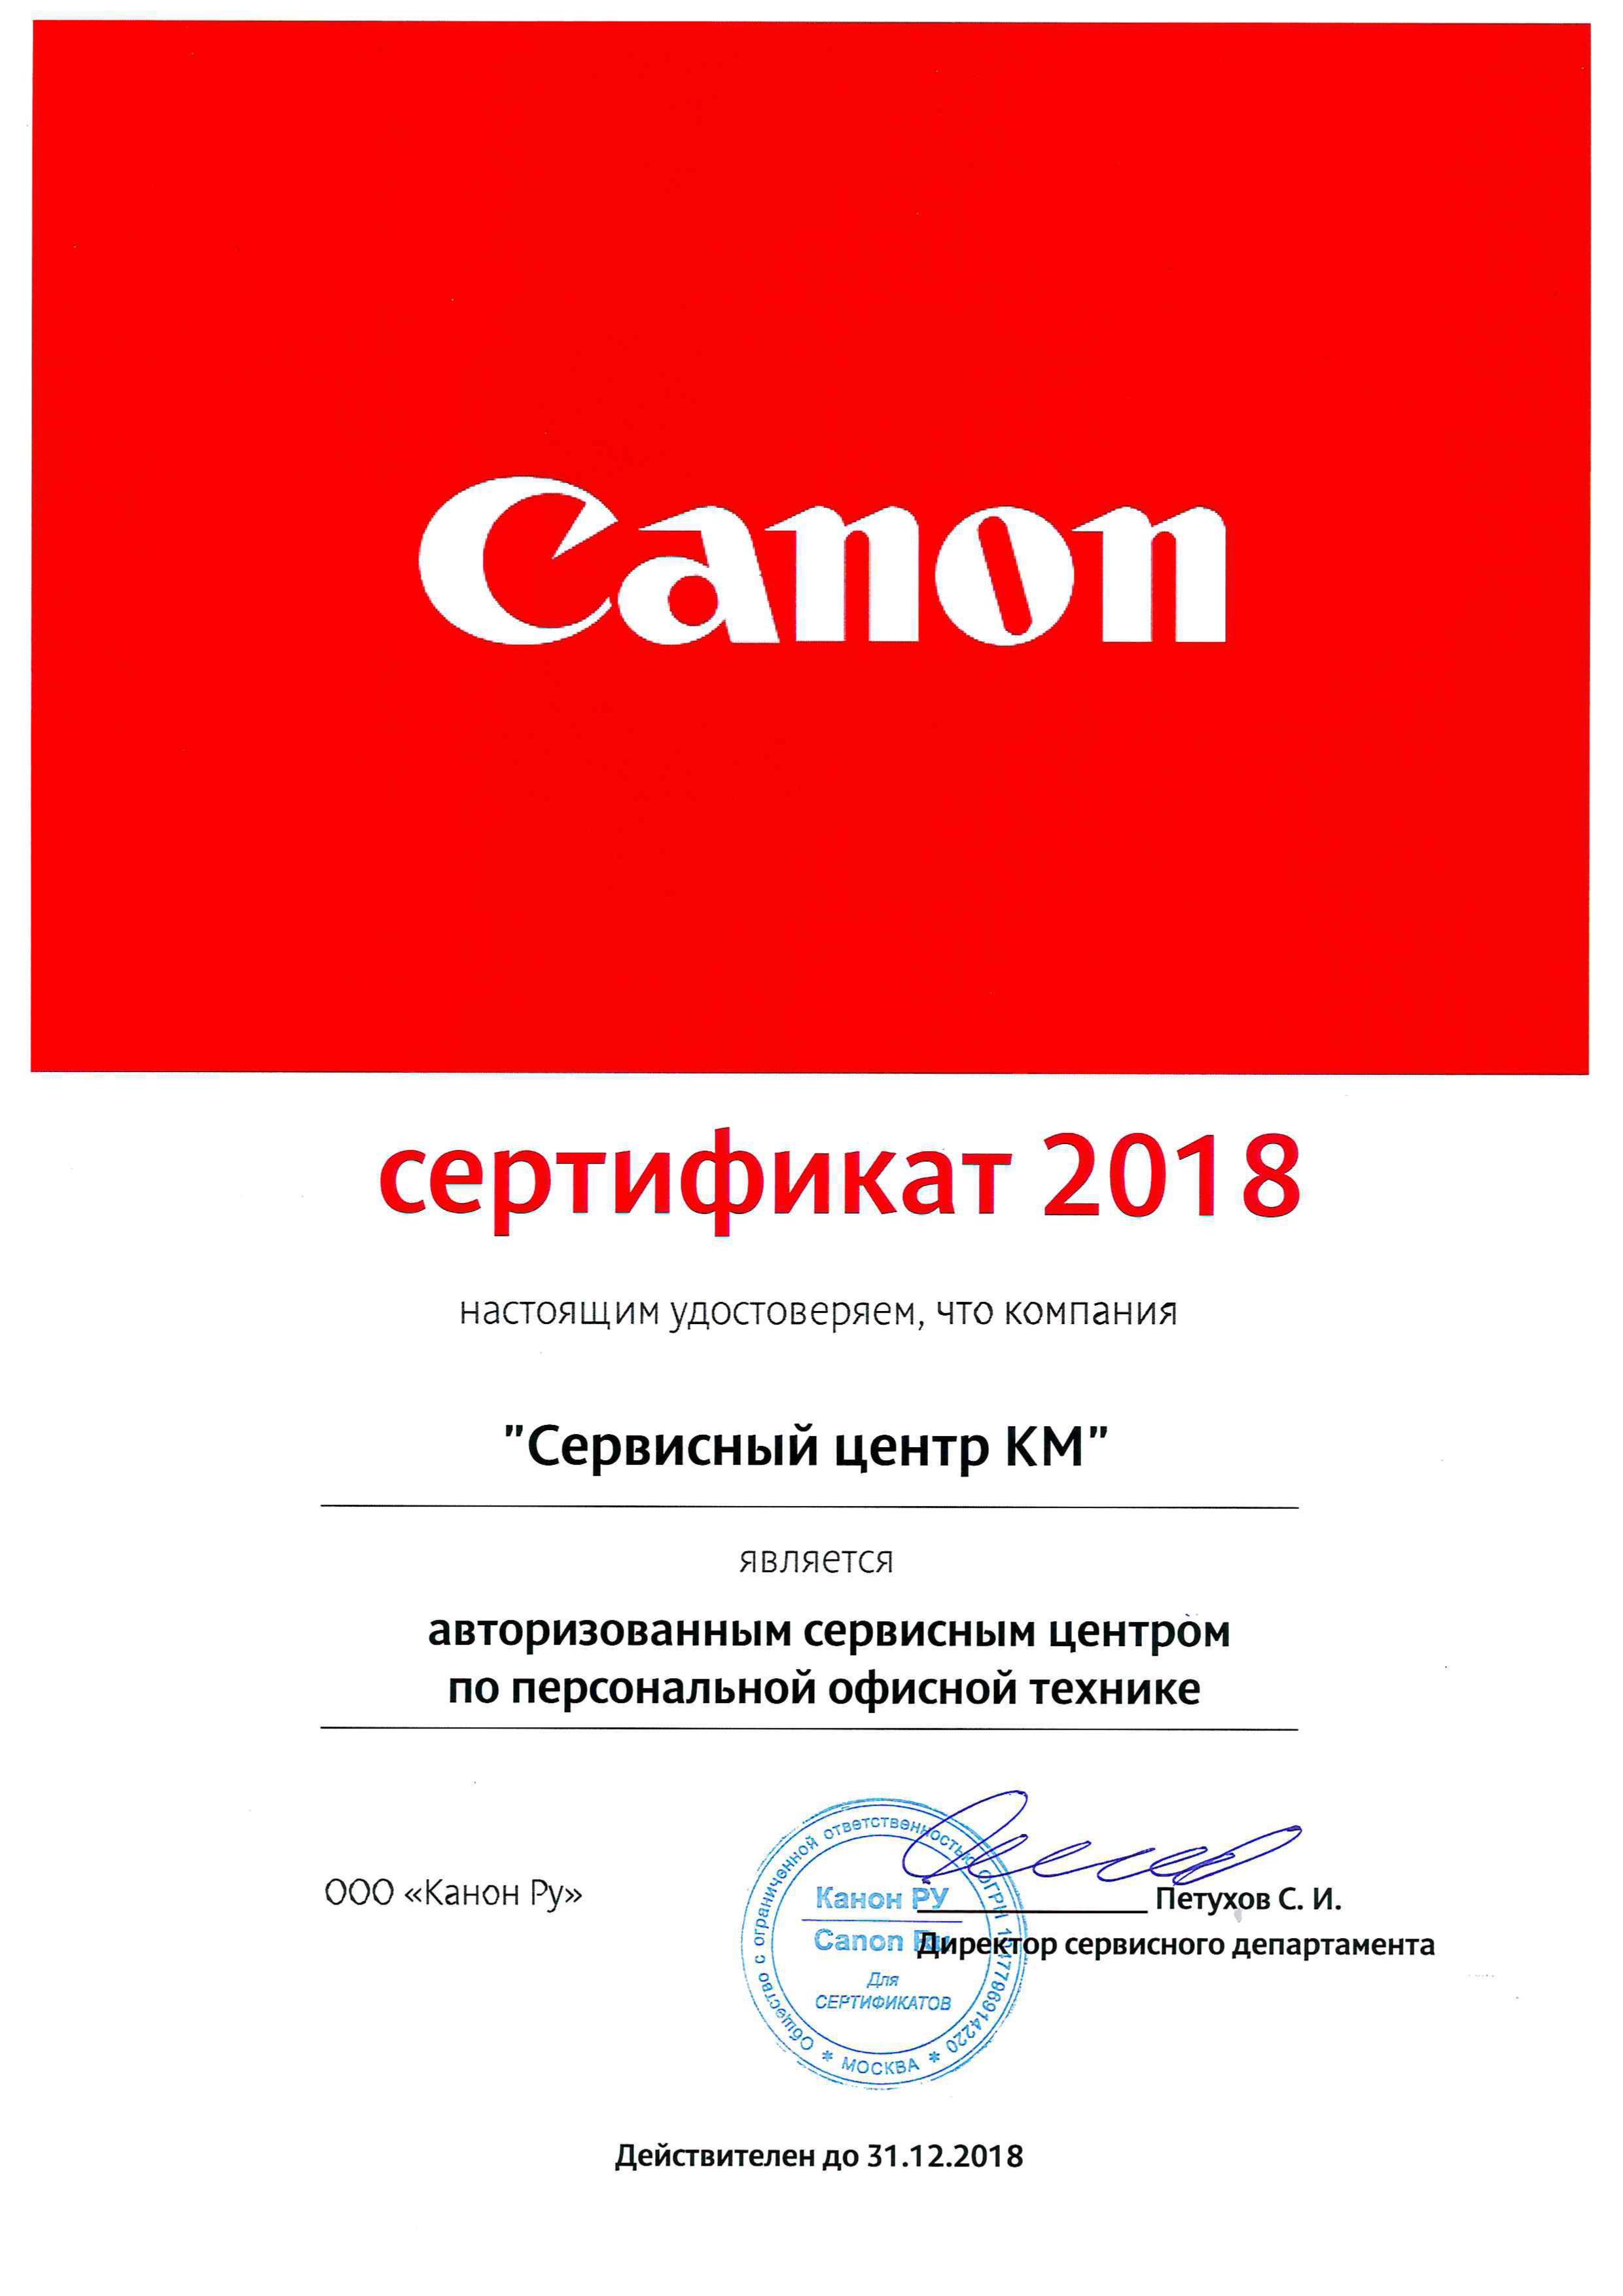 Canon персональные